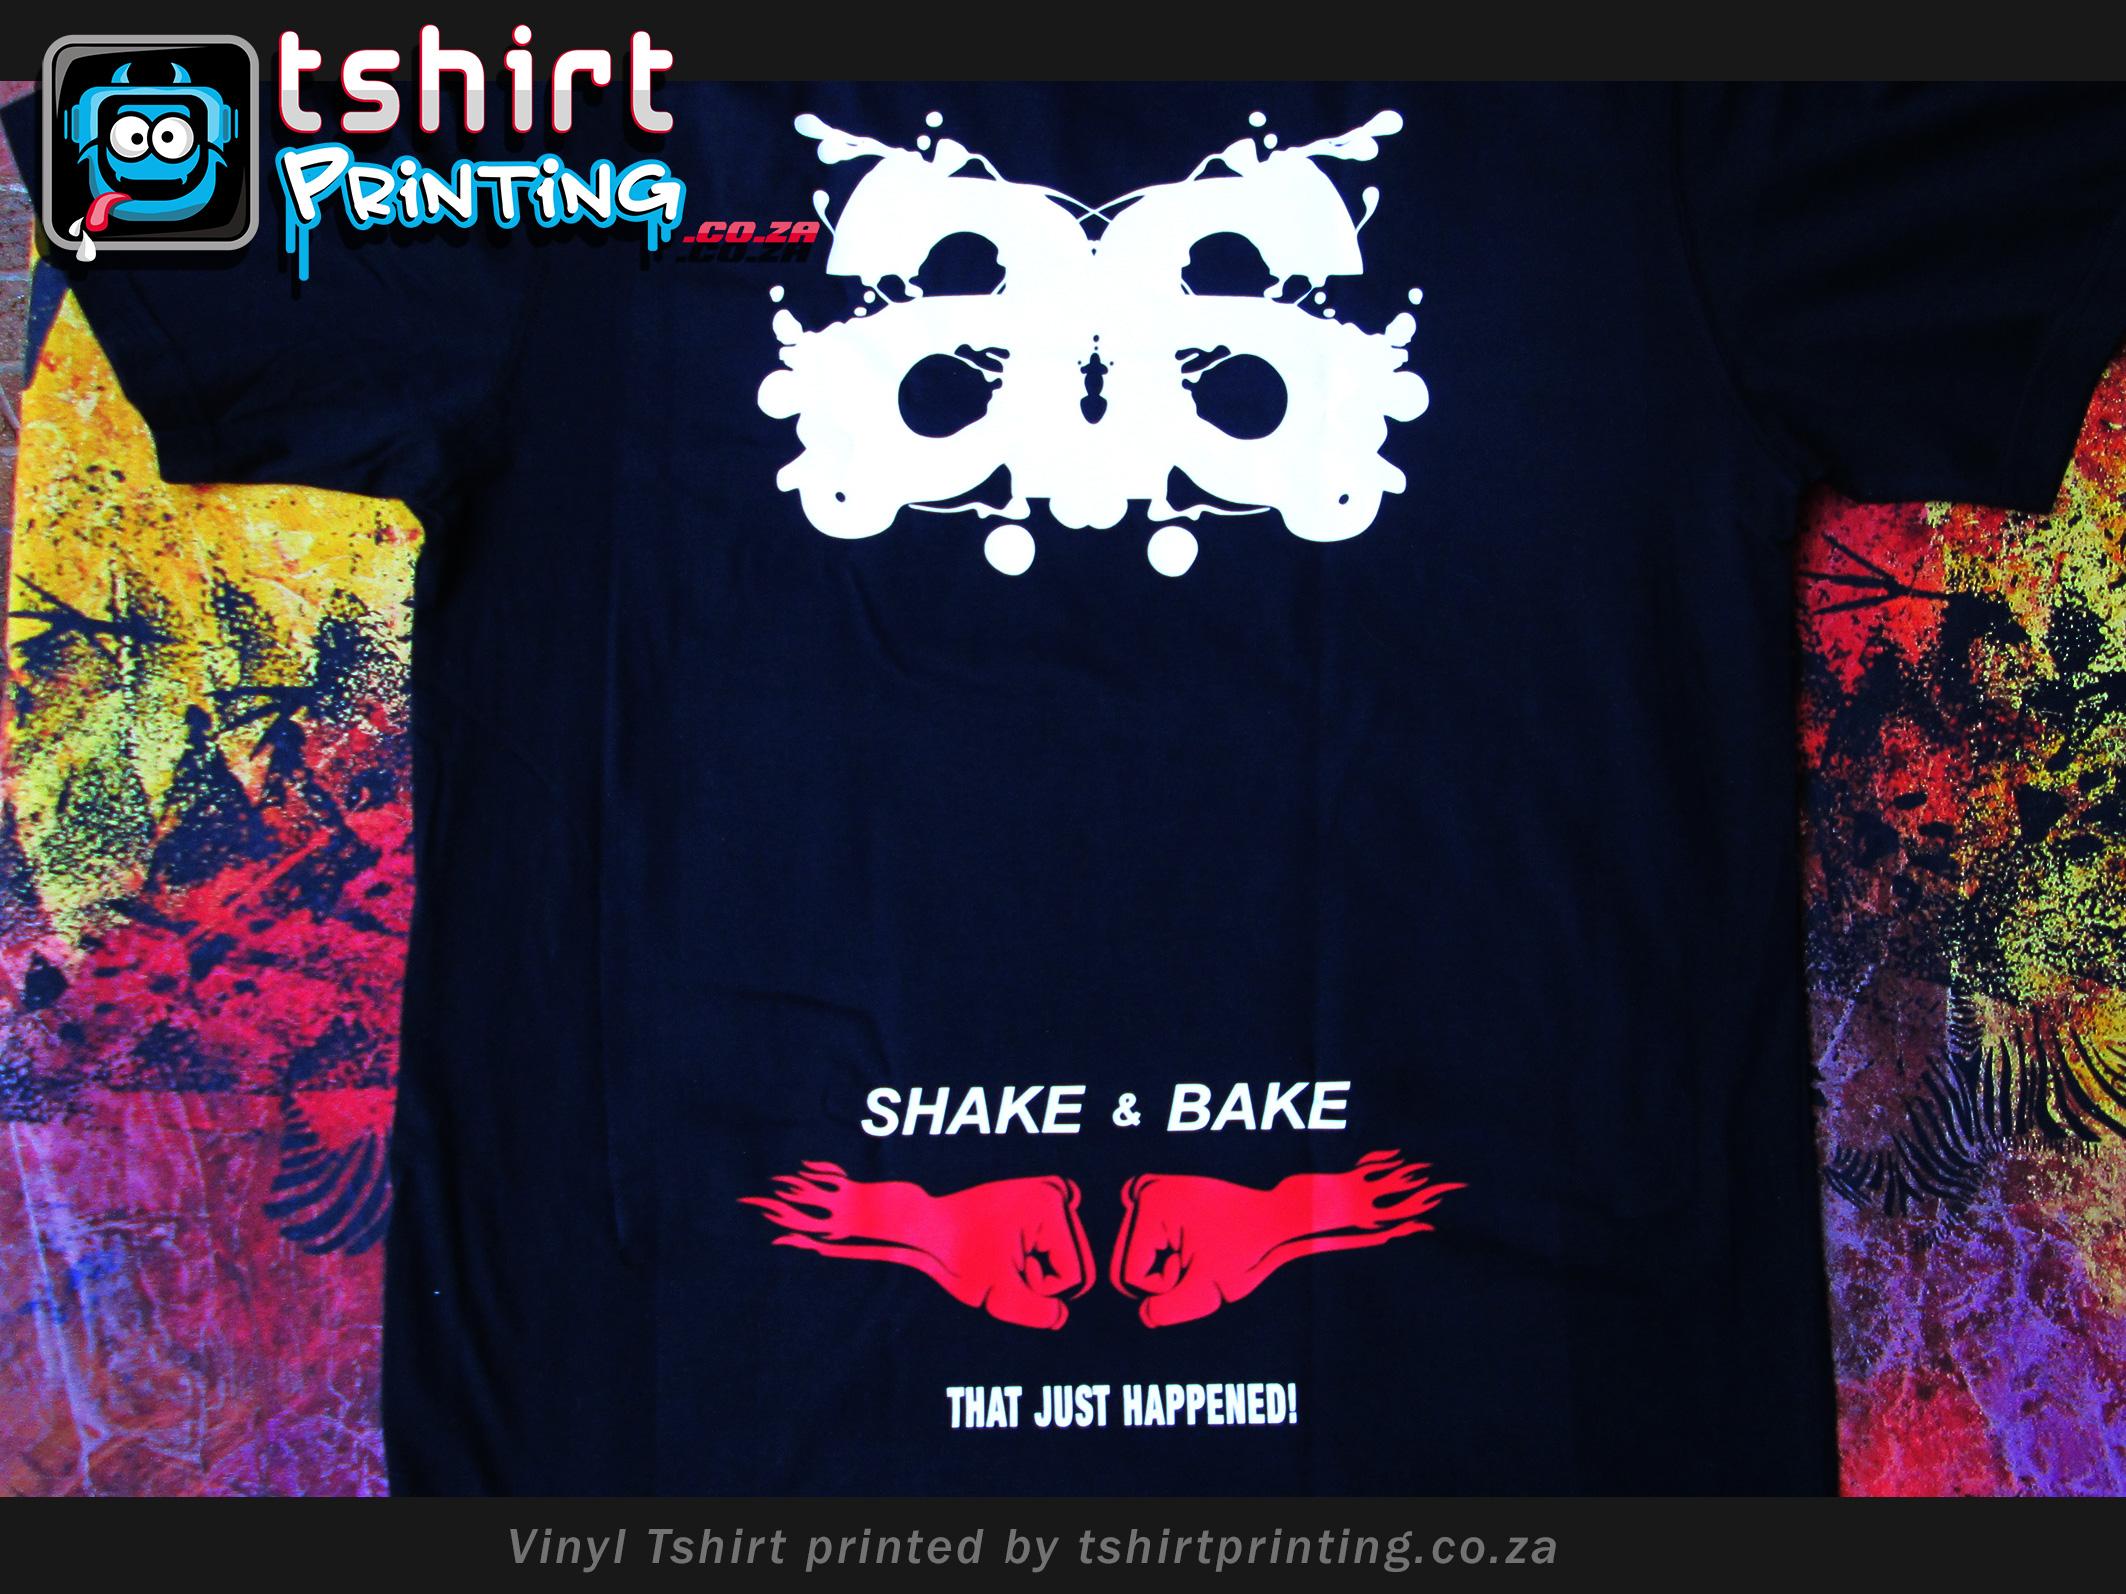 MMA tshirt vinyl printed, 2 fists hitting with flames, flame fist tshirt, splatter tshirt printed,vinyl splatter effect